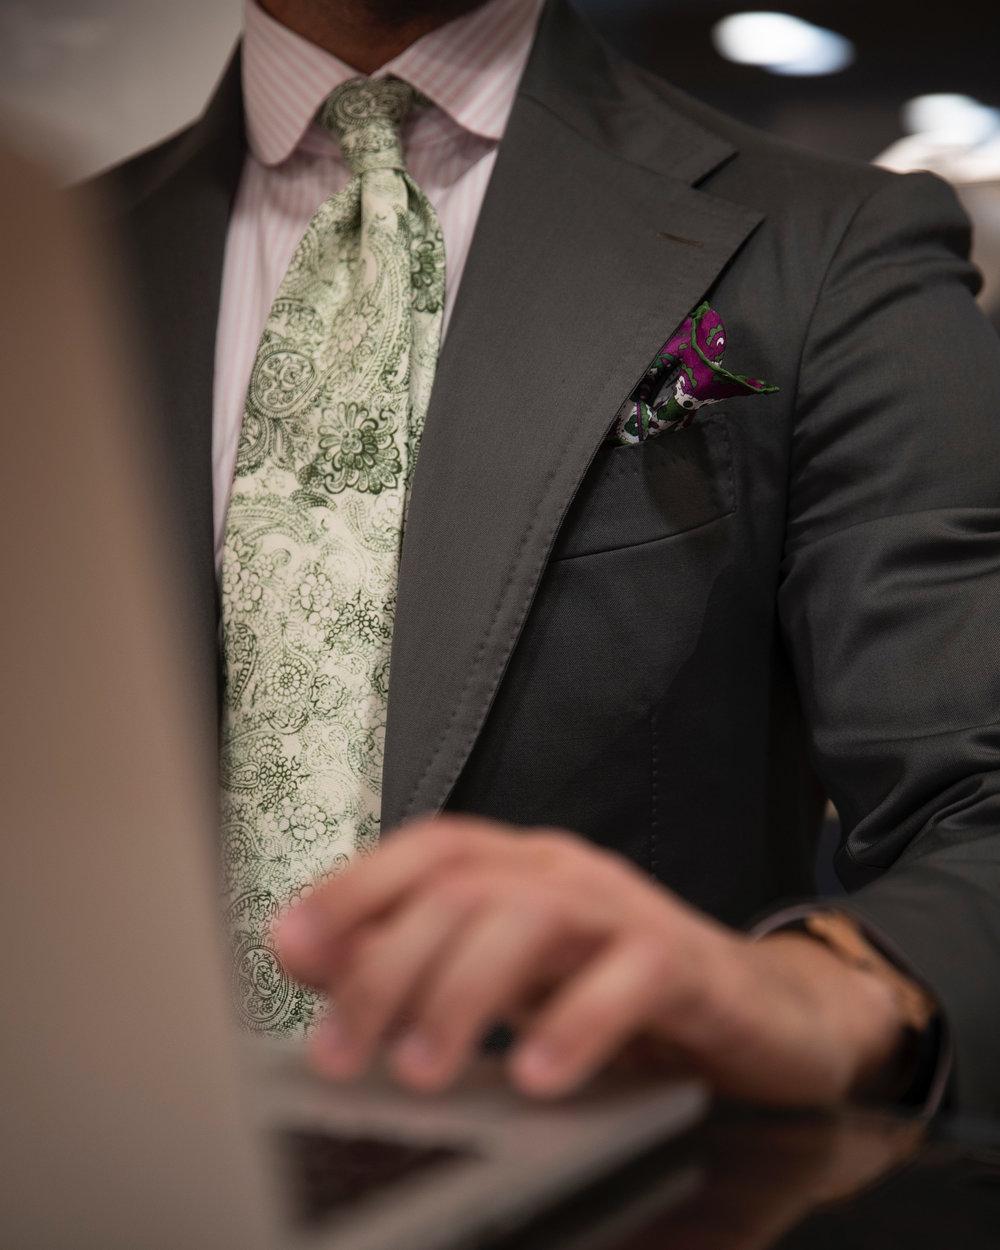 La Cravatta Amarcord. - what makes it so special